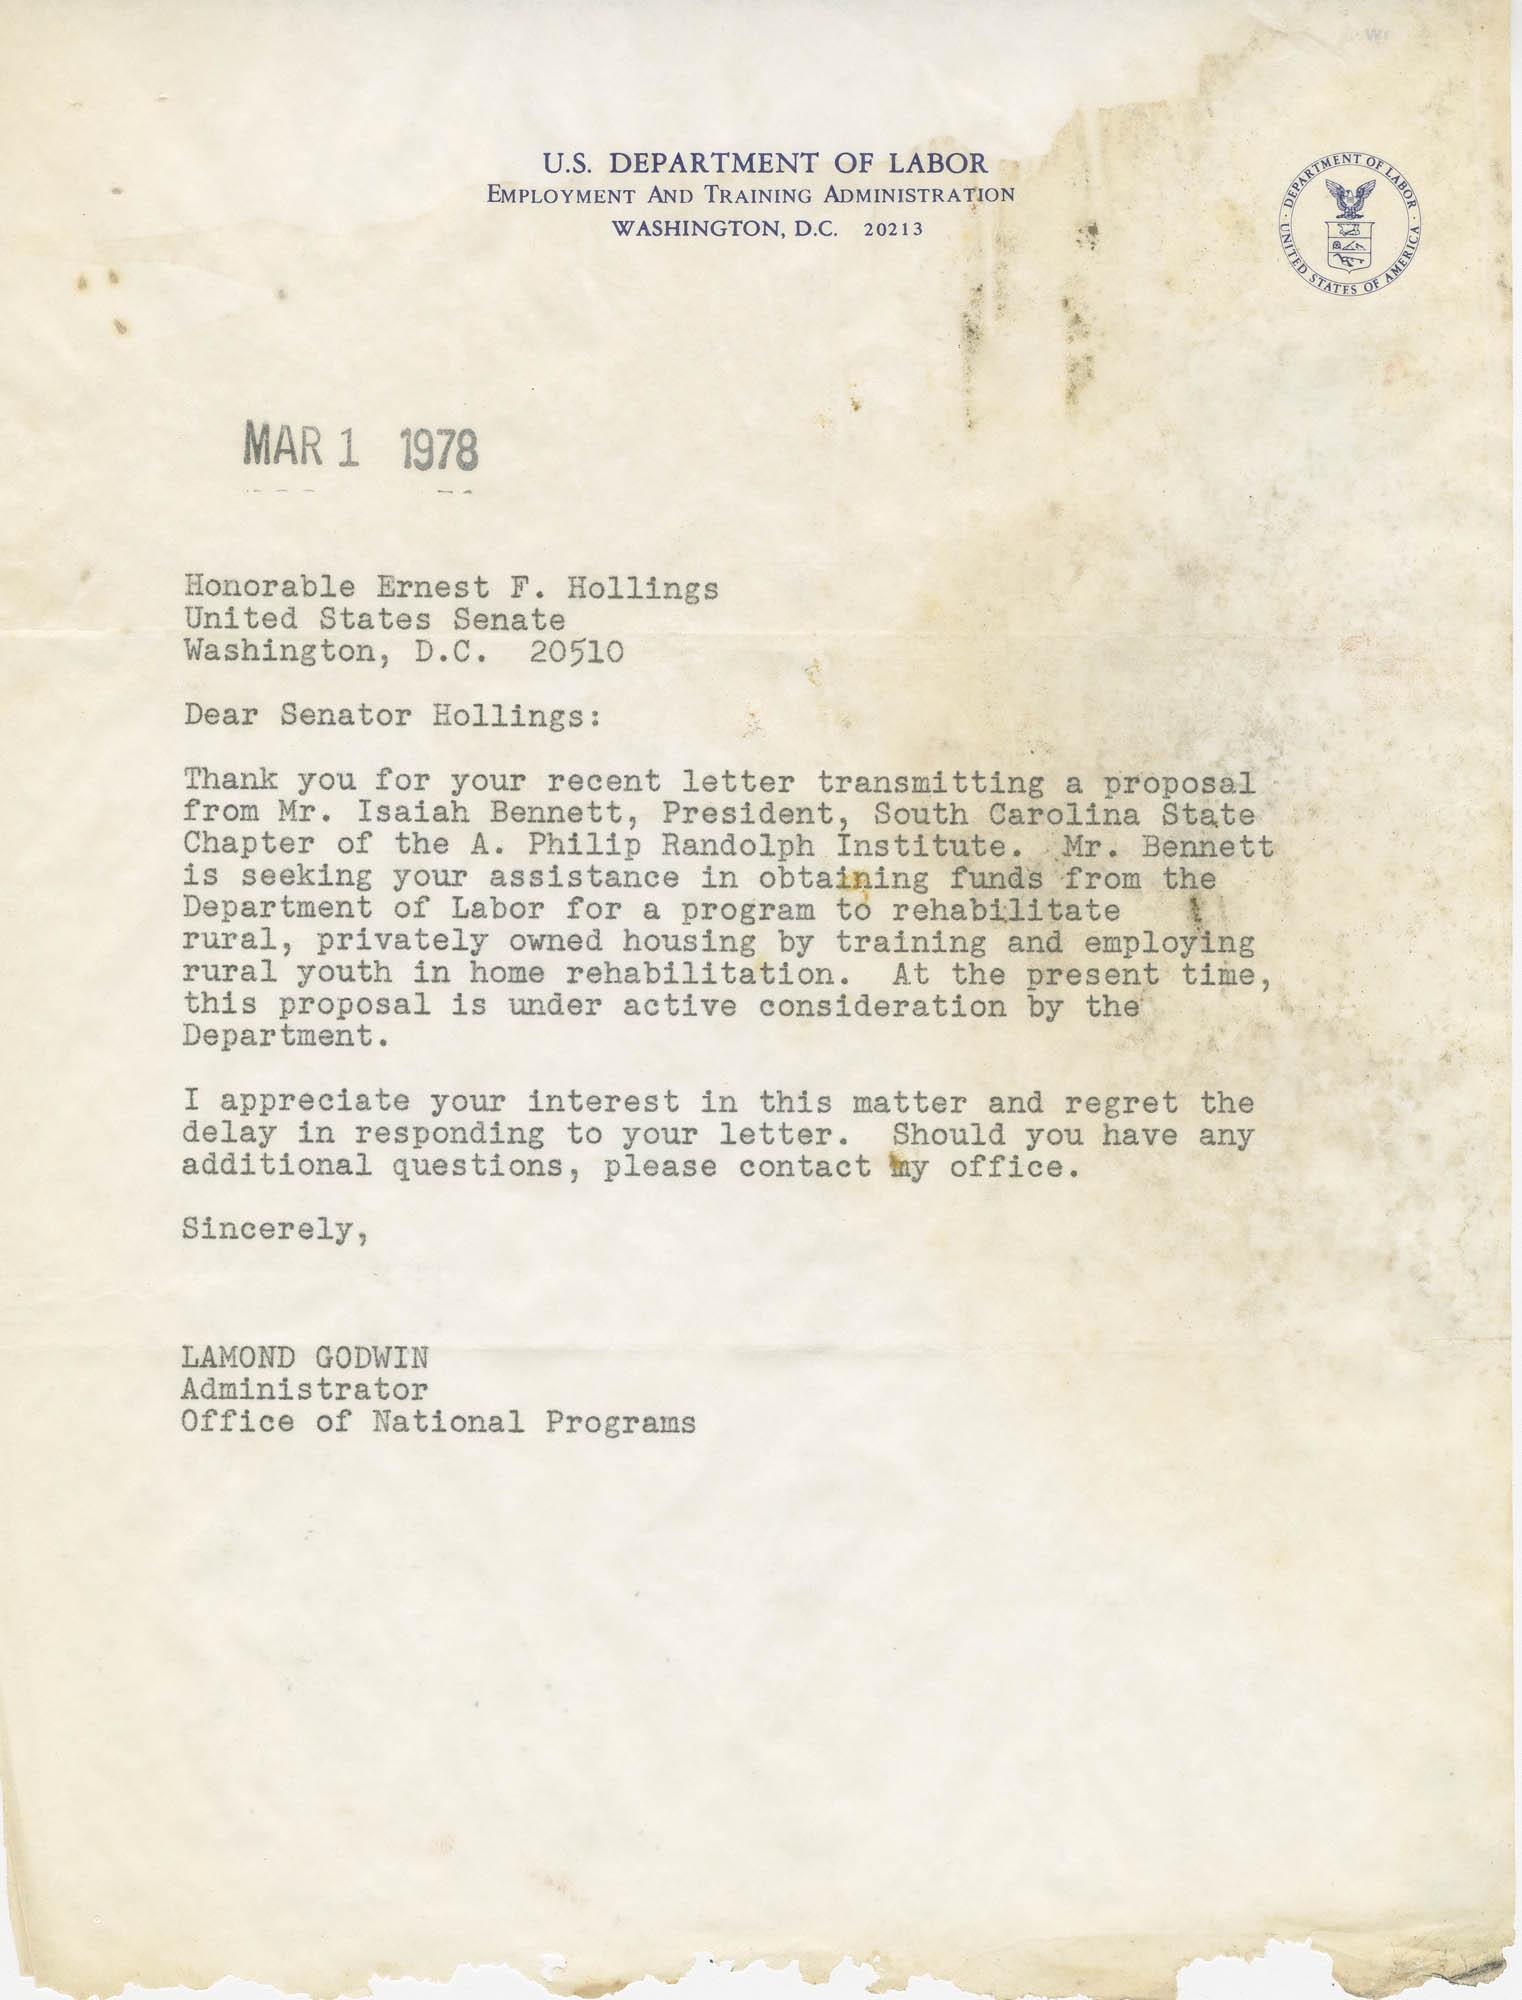 Letter from Lamond Godwin to Senator Ernest F. Hollings